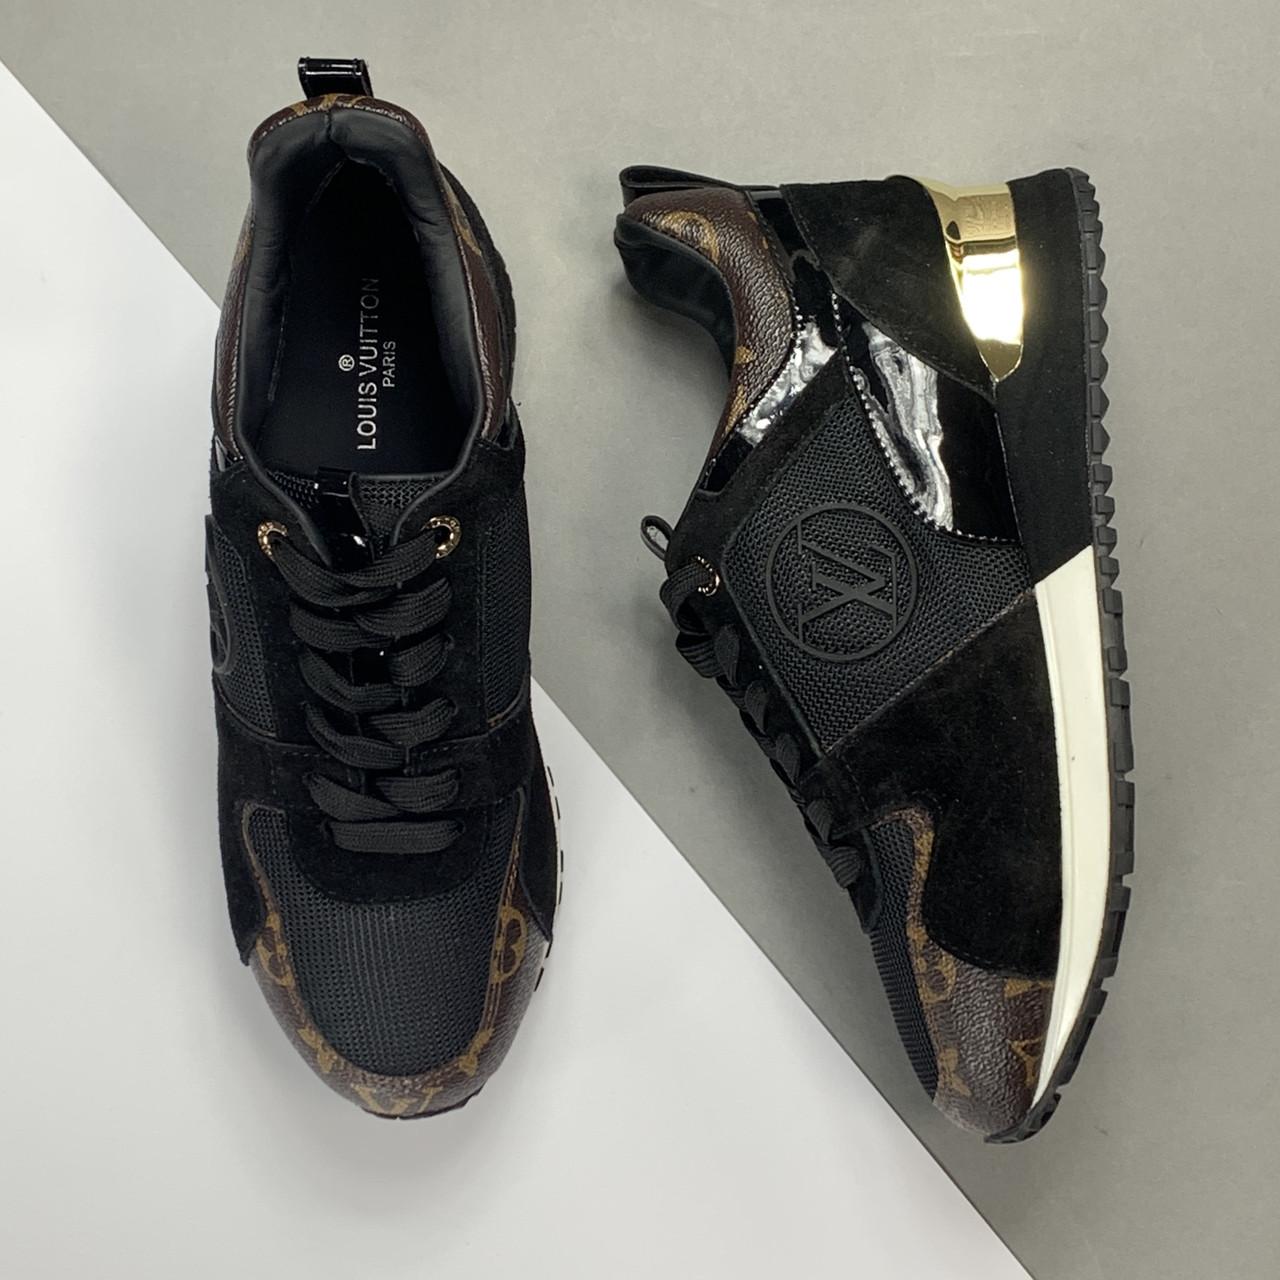 Женские кроссовки Louis Vuitton Run Away (Луи Виттон Ран Эвей) арт. 105-01